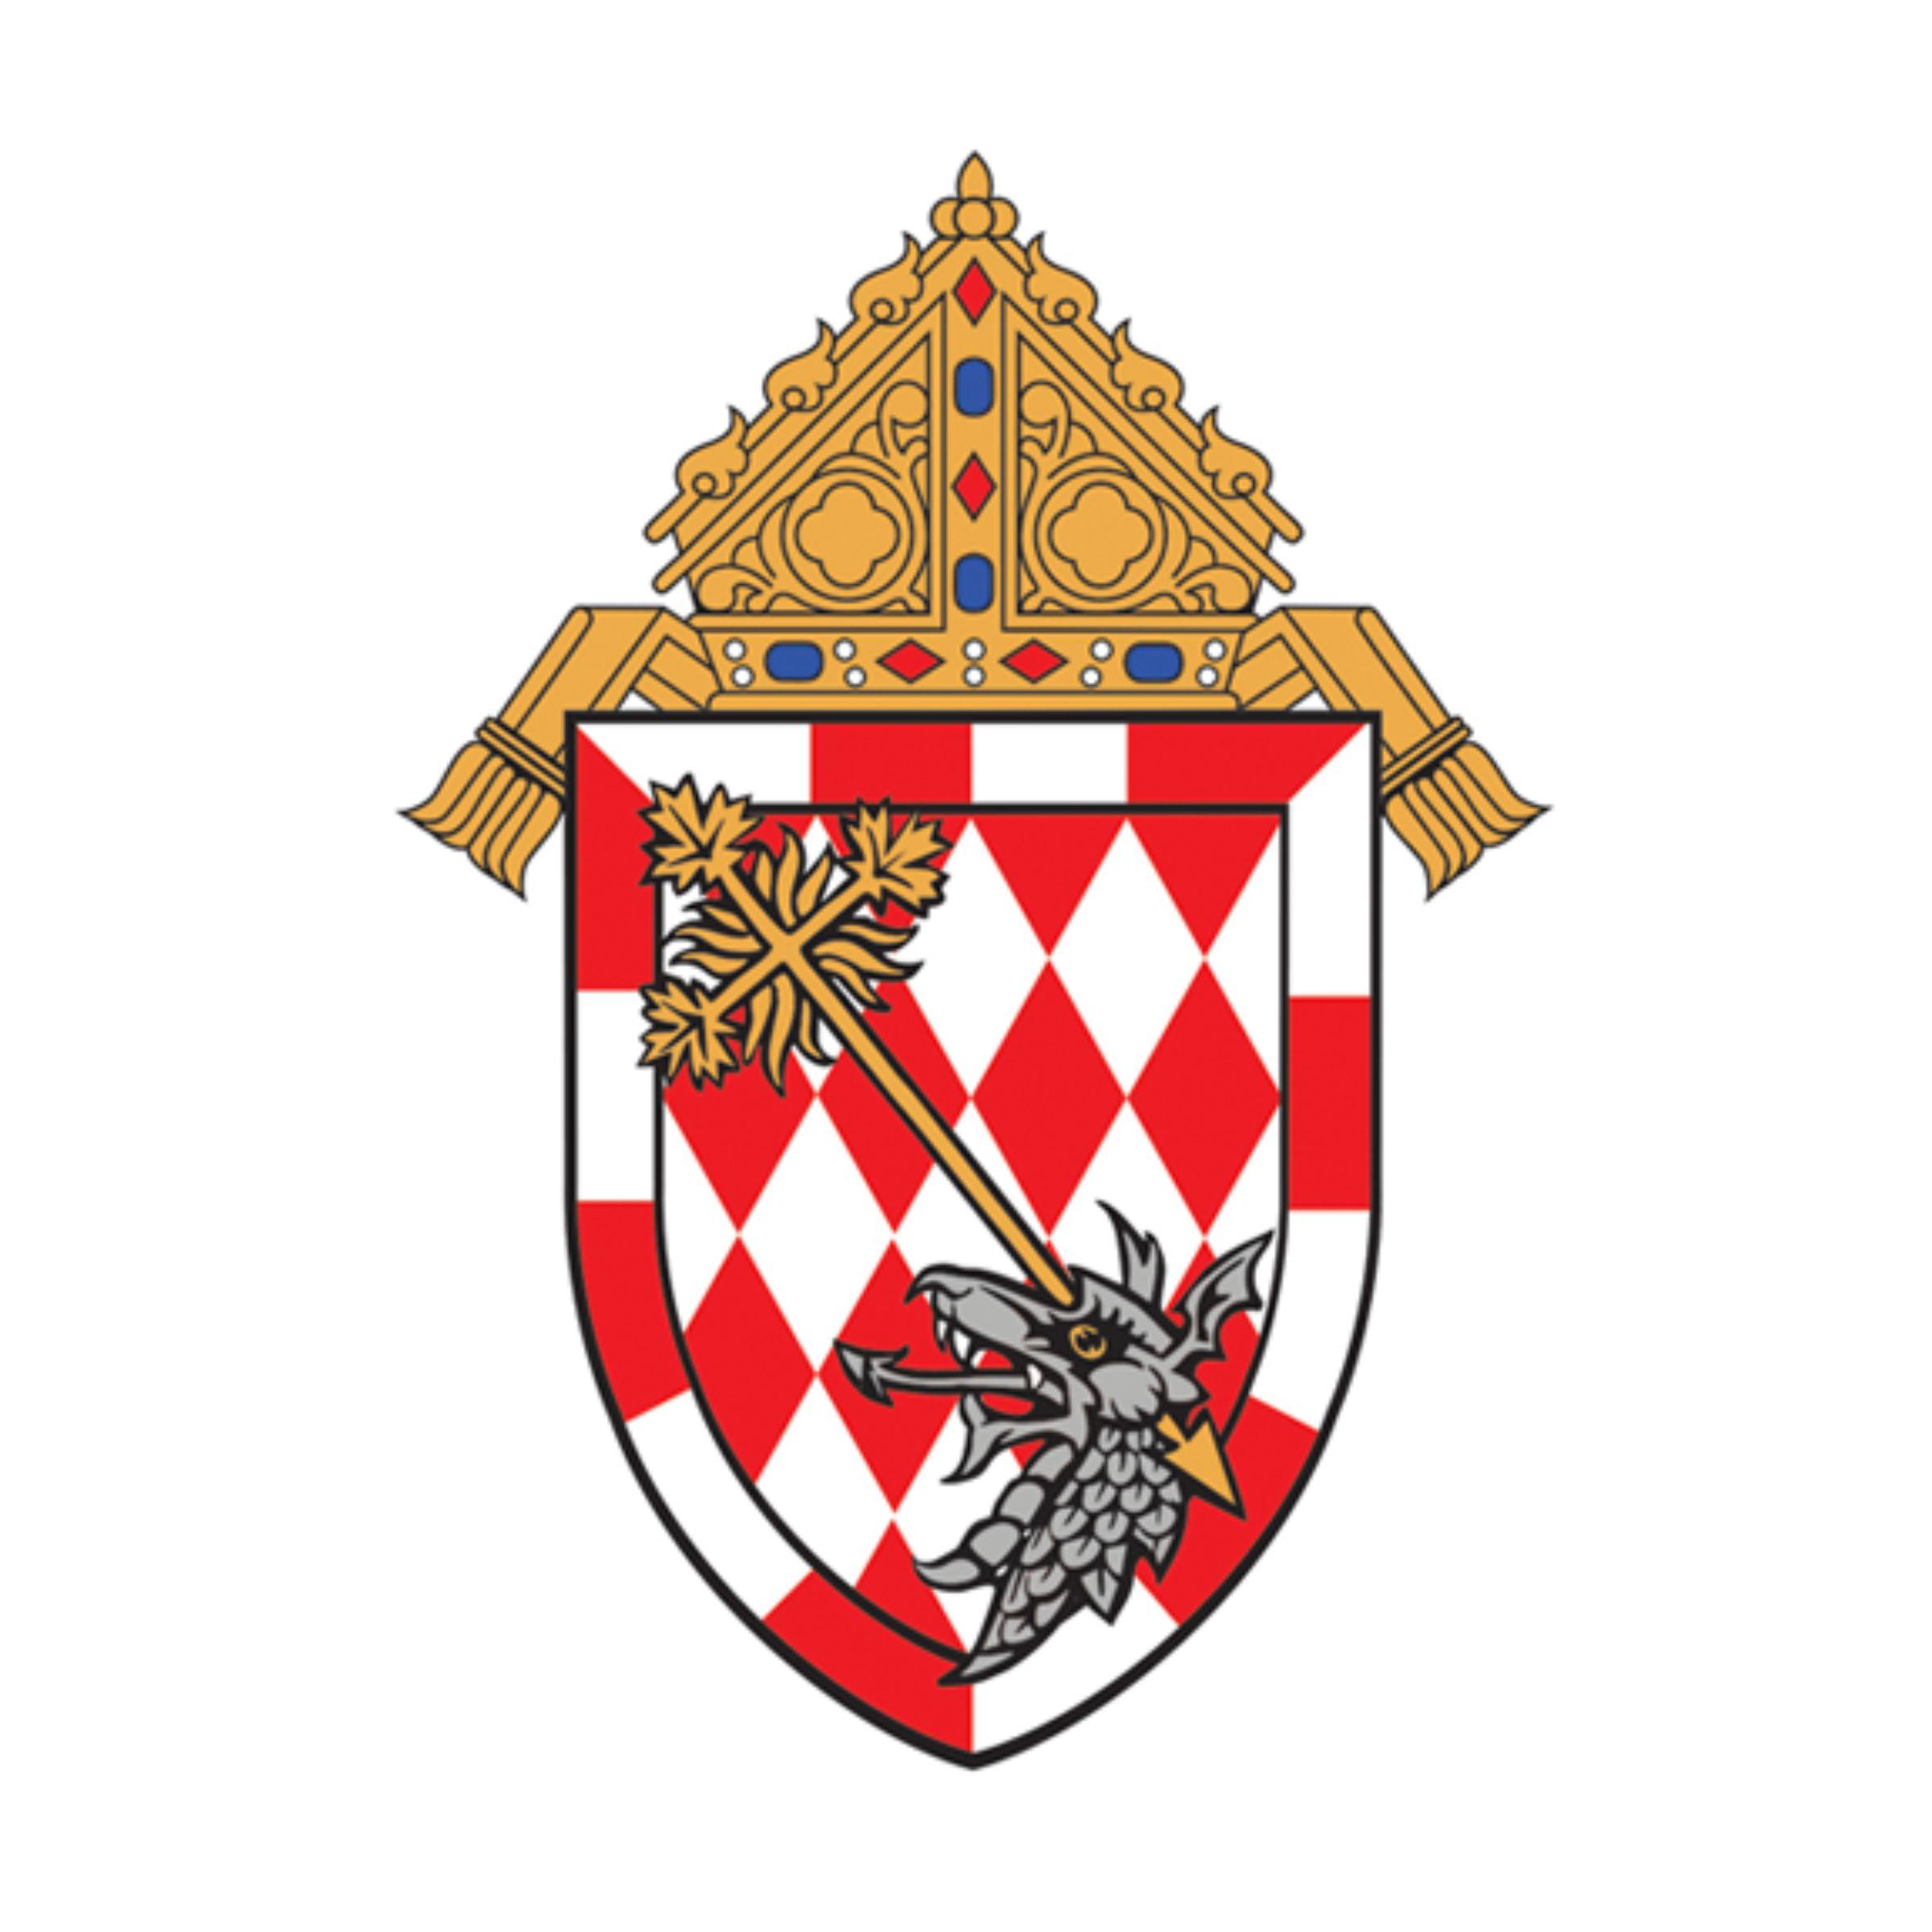 Archdiocesan COA